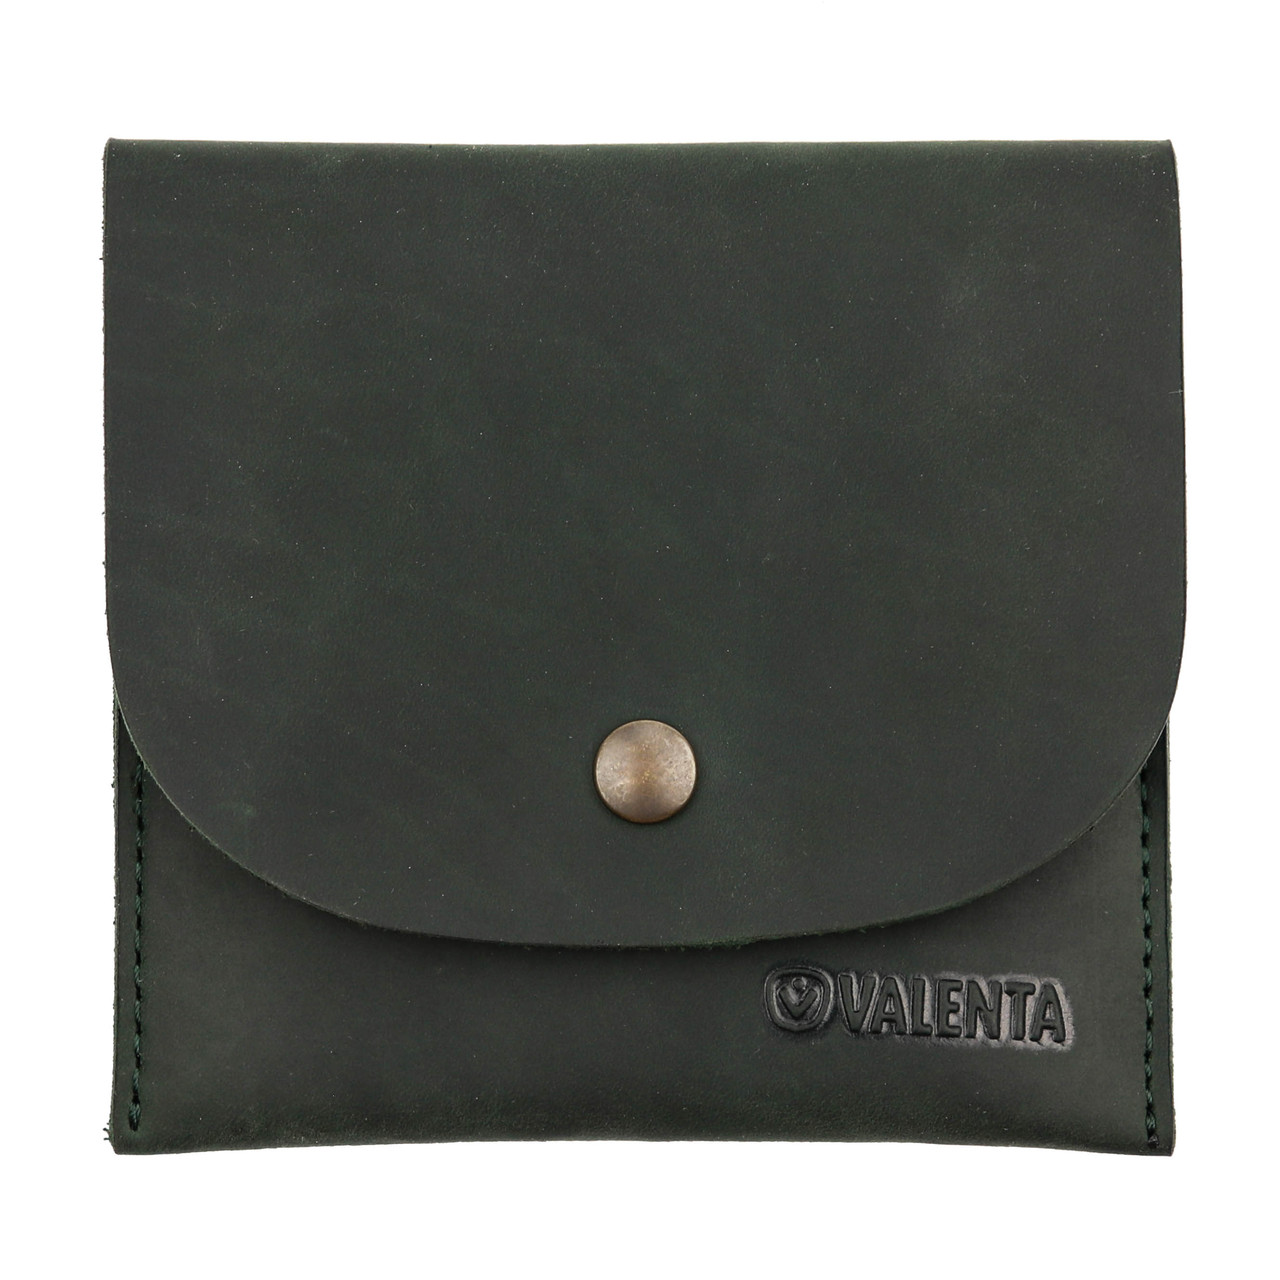 Маленький кошелек Valenta Encore Темно-зеленый (ХР23042)